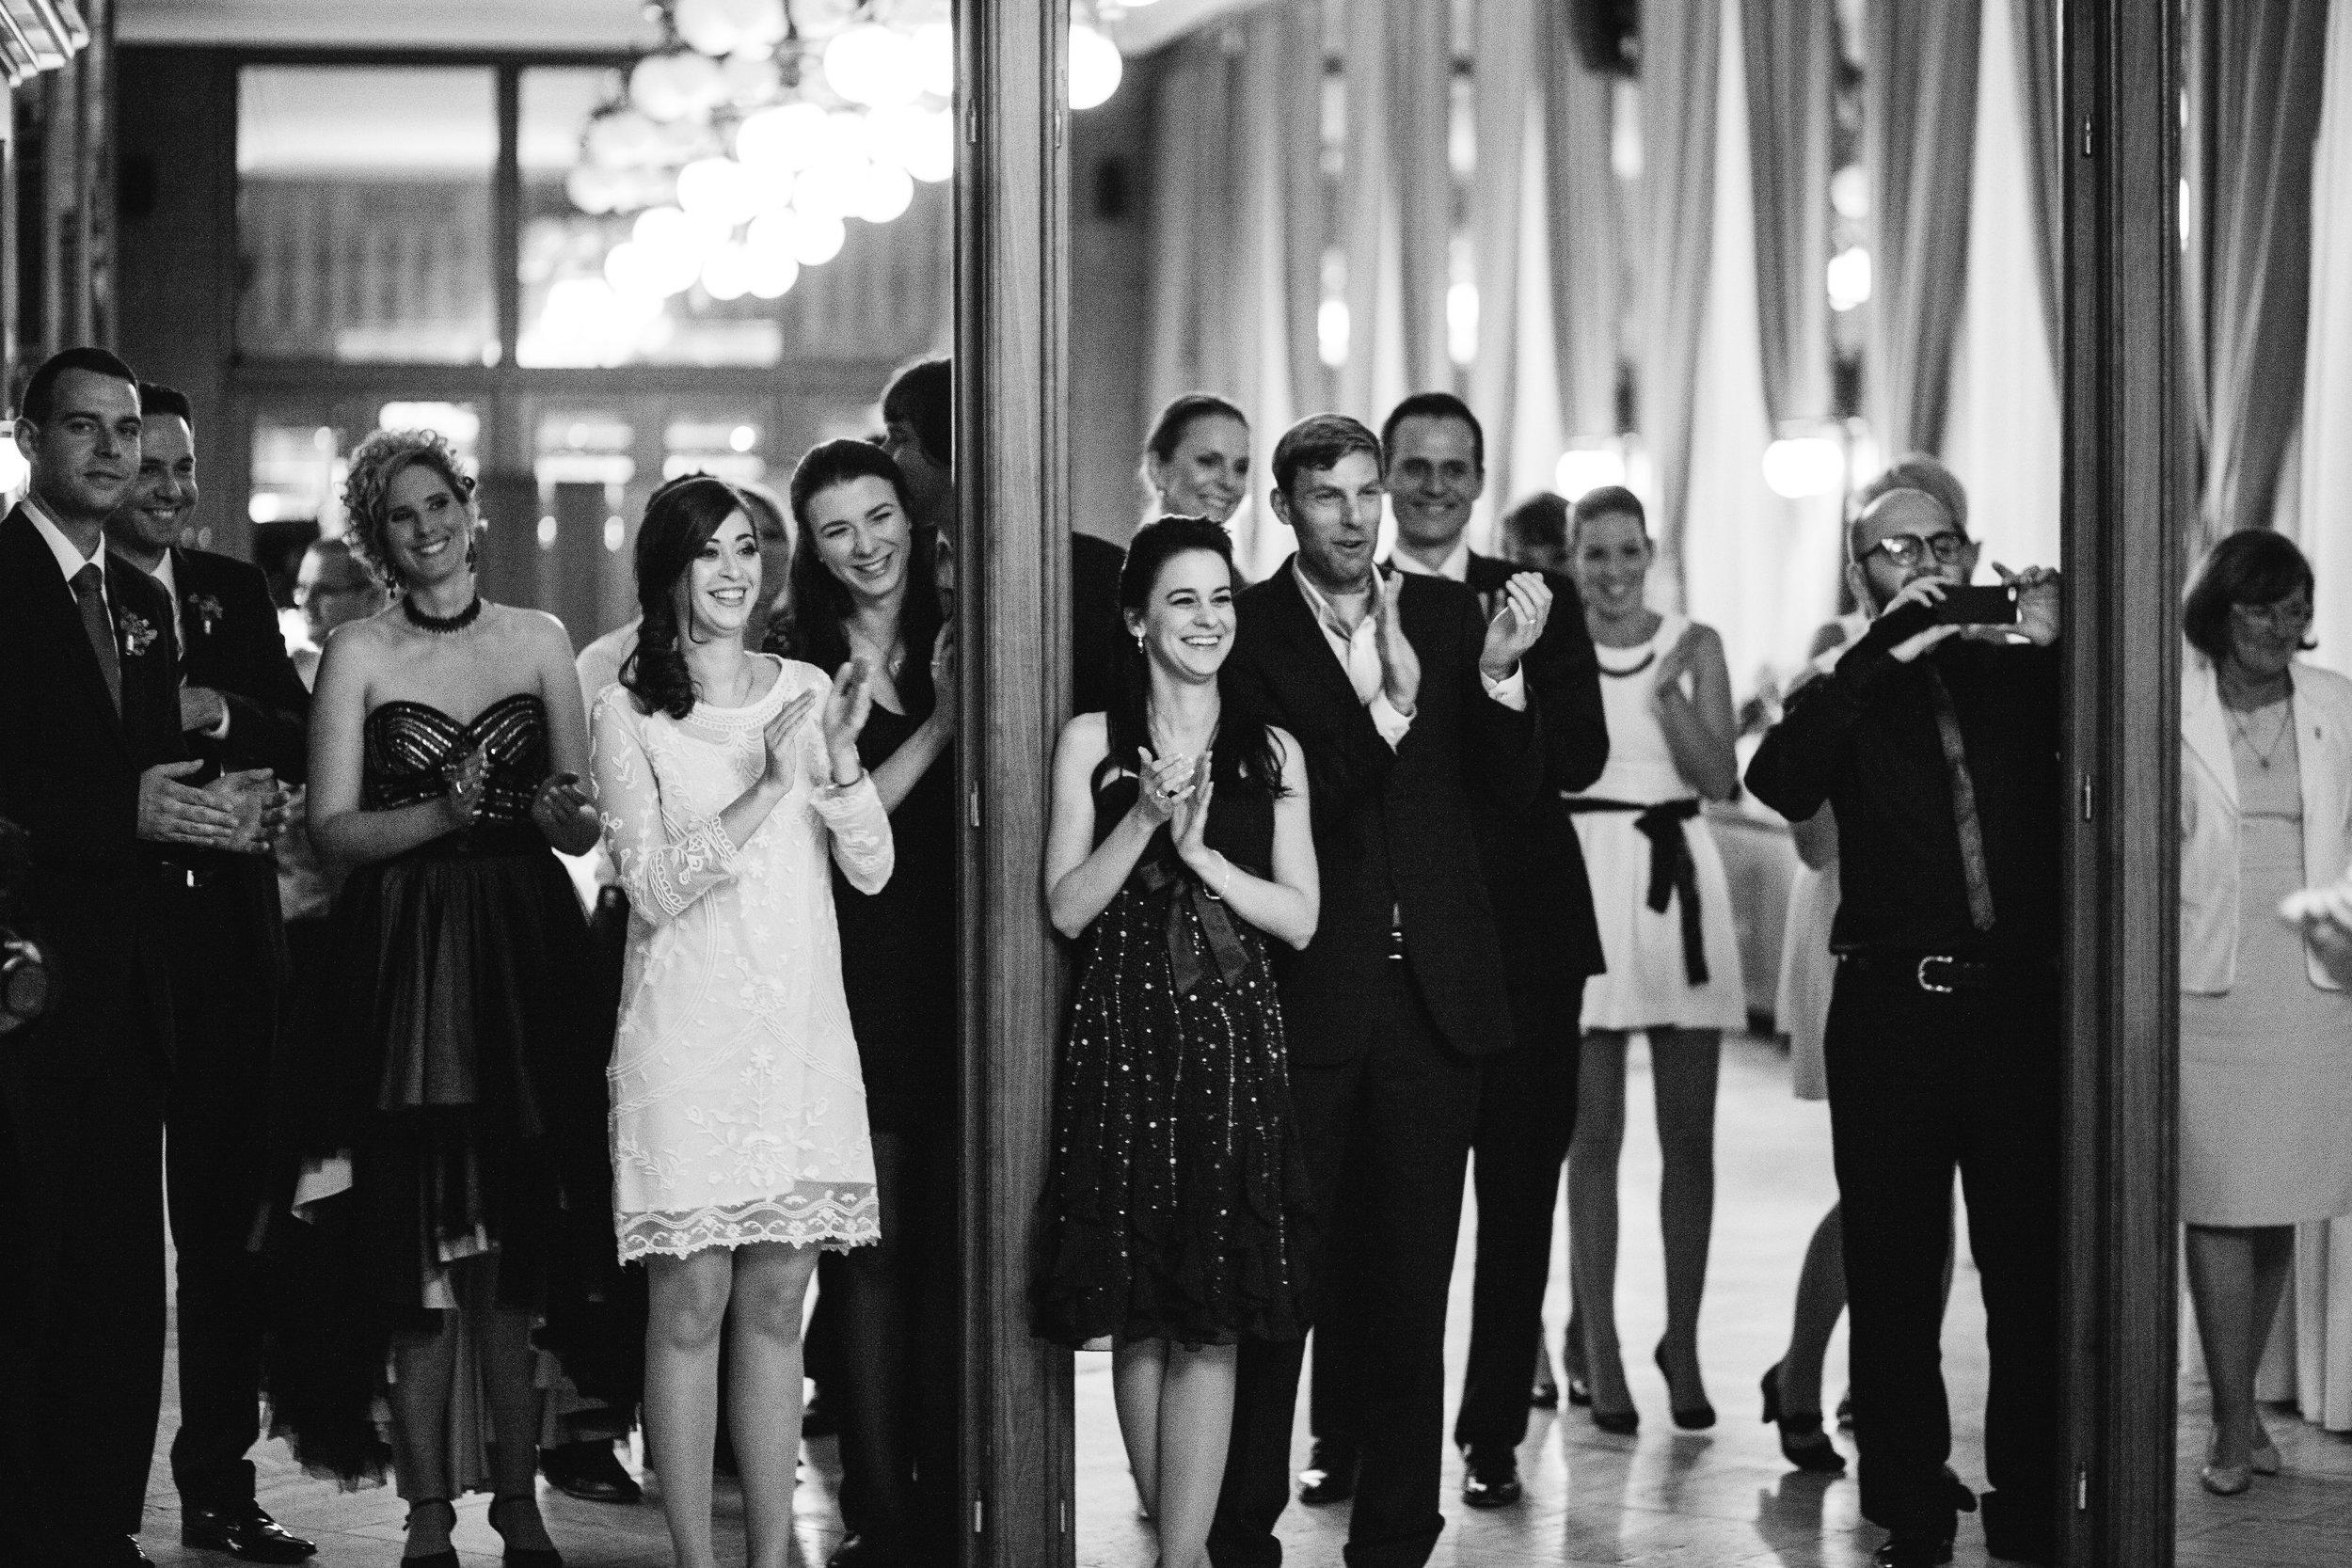 destination-wedding-photographer-slovakia-bratislava-bw-documentary-style-guests-2.jpg